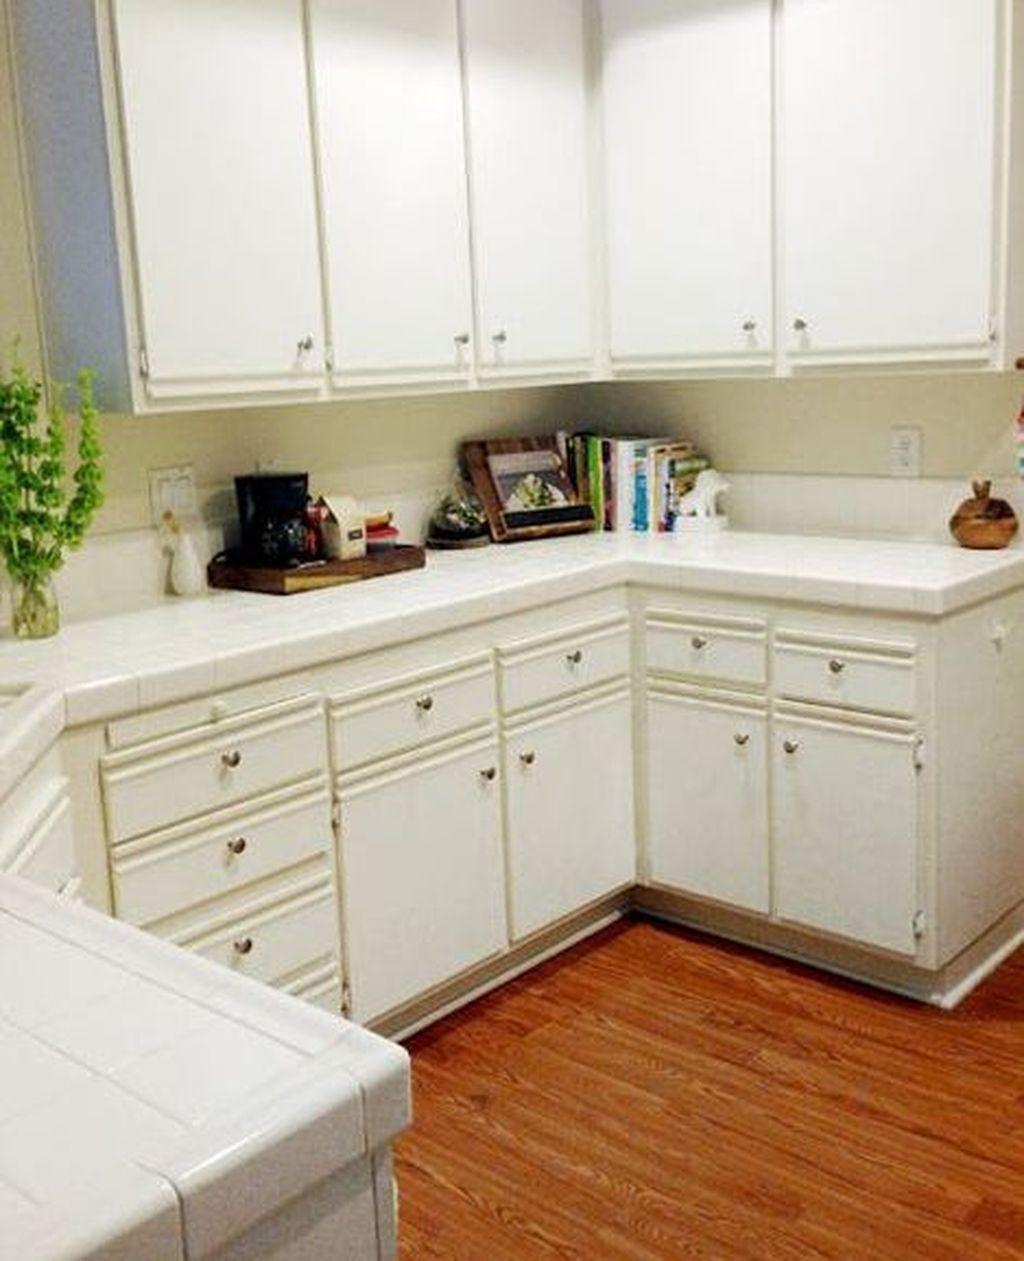 45 fabulous kitchen cabinet design for apartment kitchen kitchen rh pinterest com